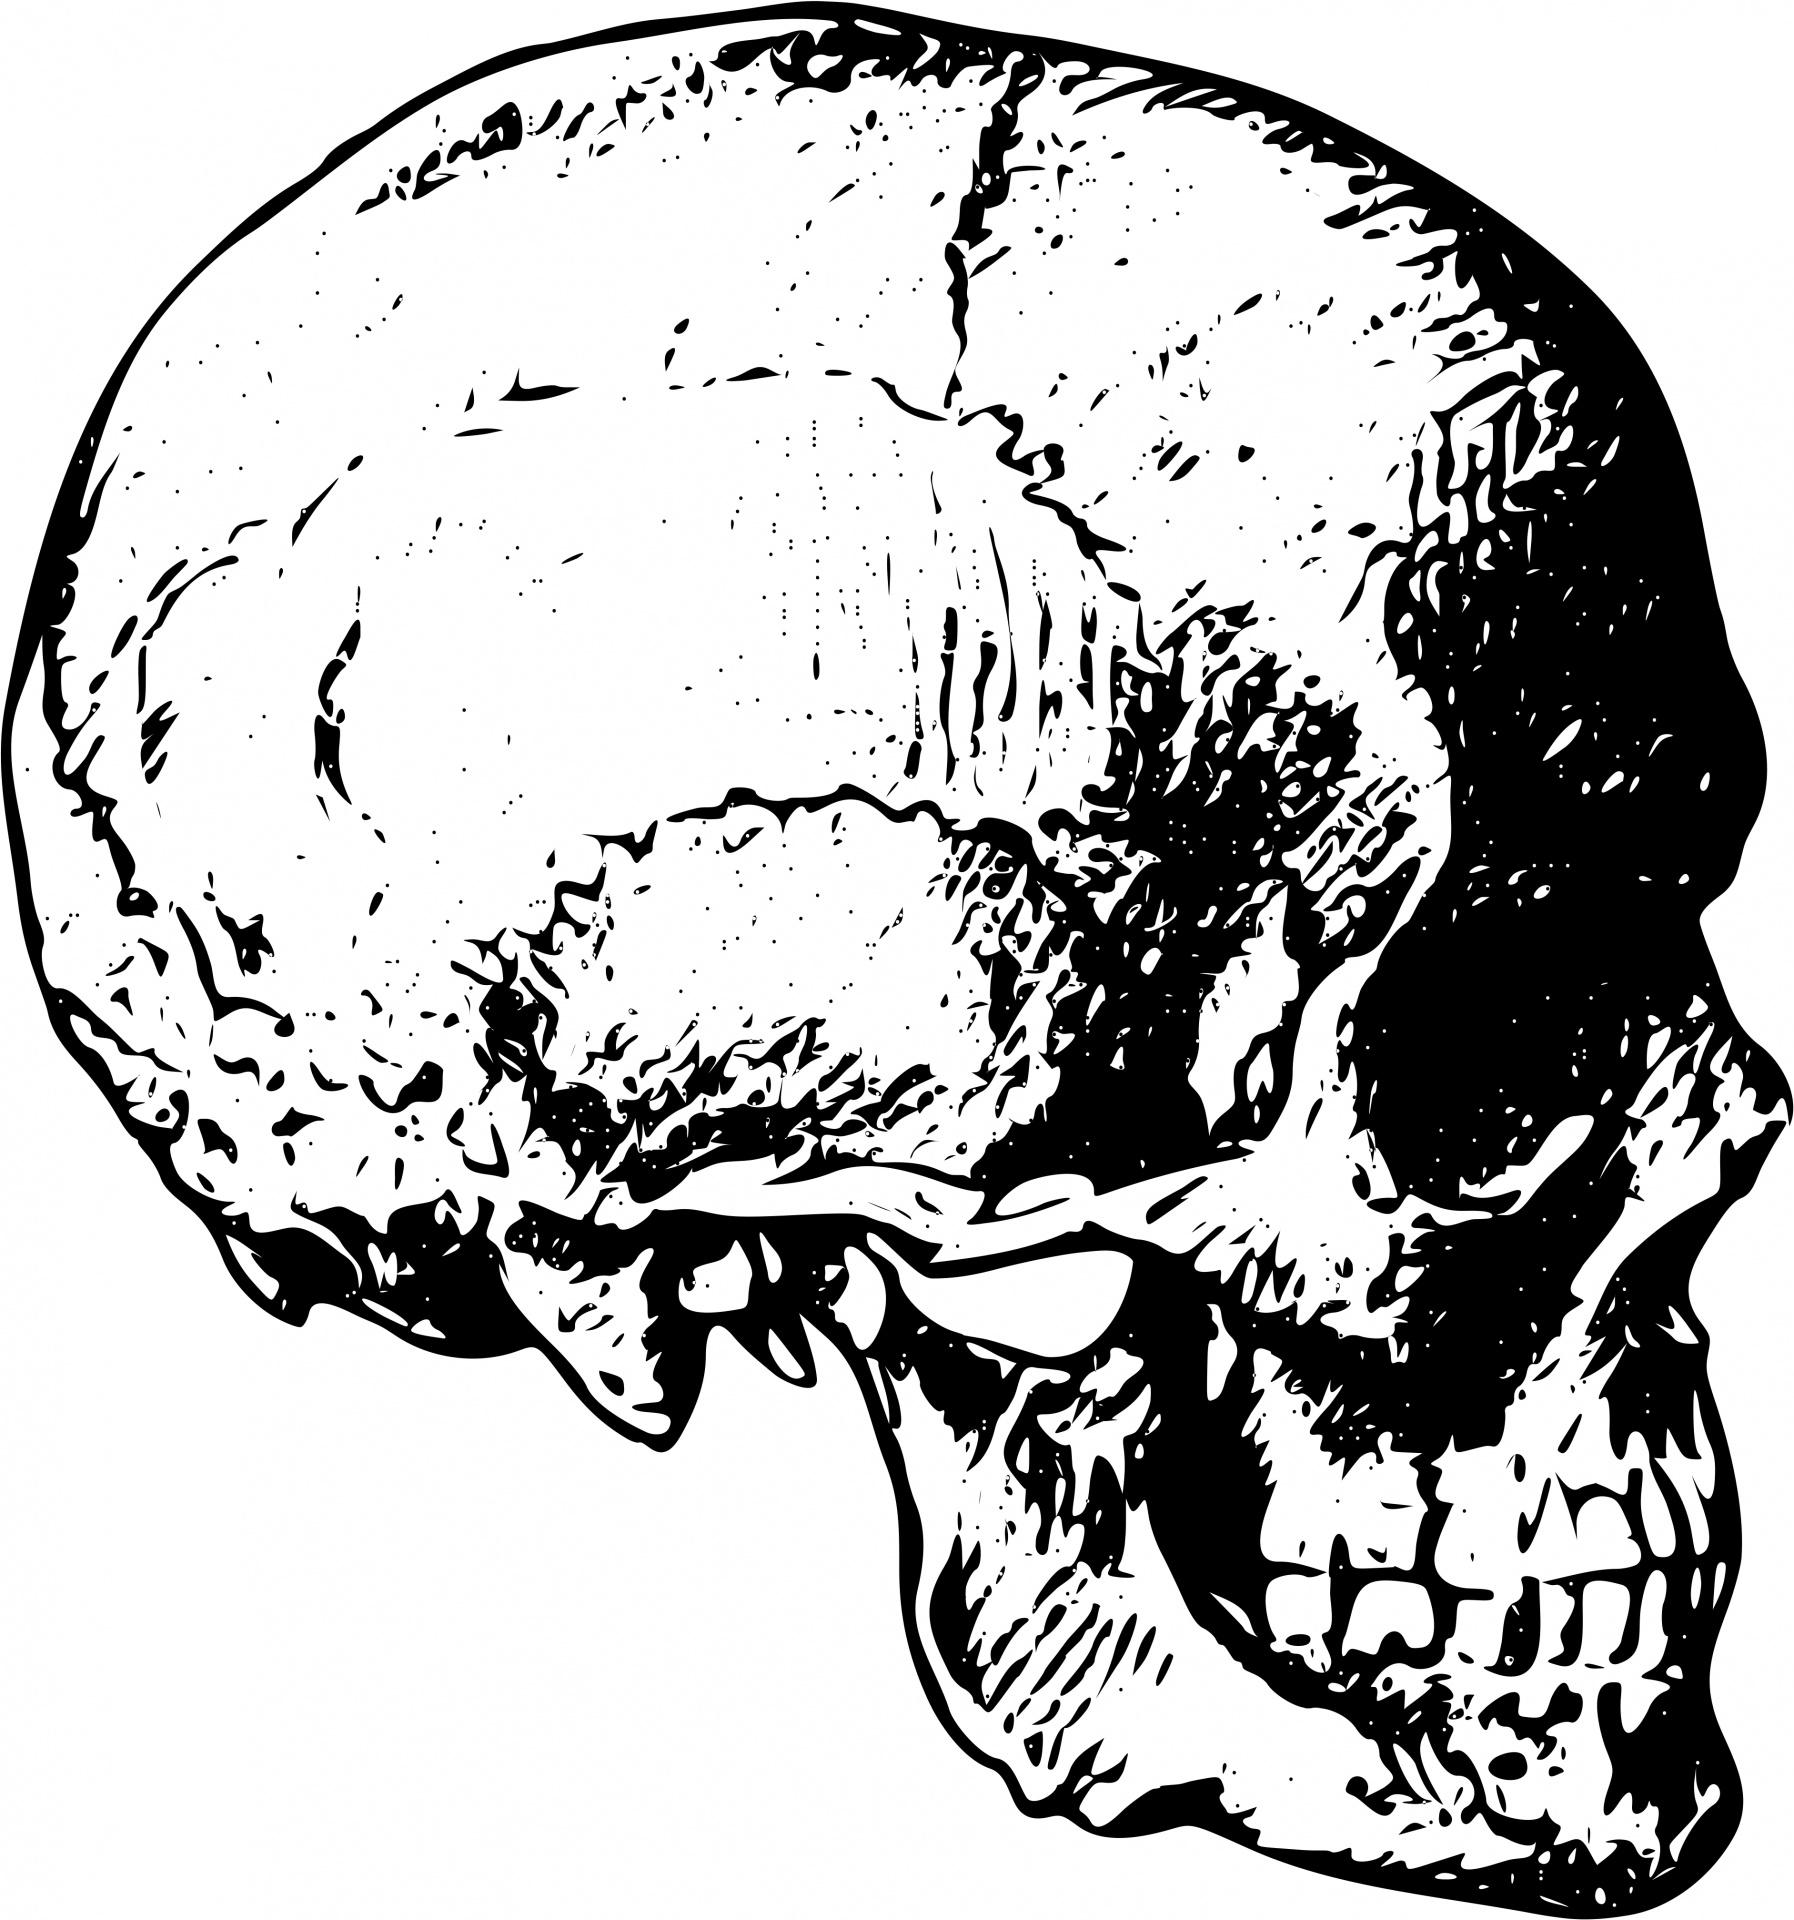 Human Skull Free Stock Photo